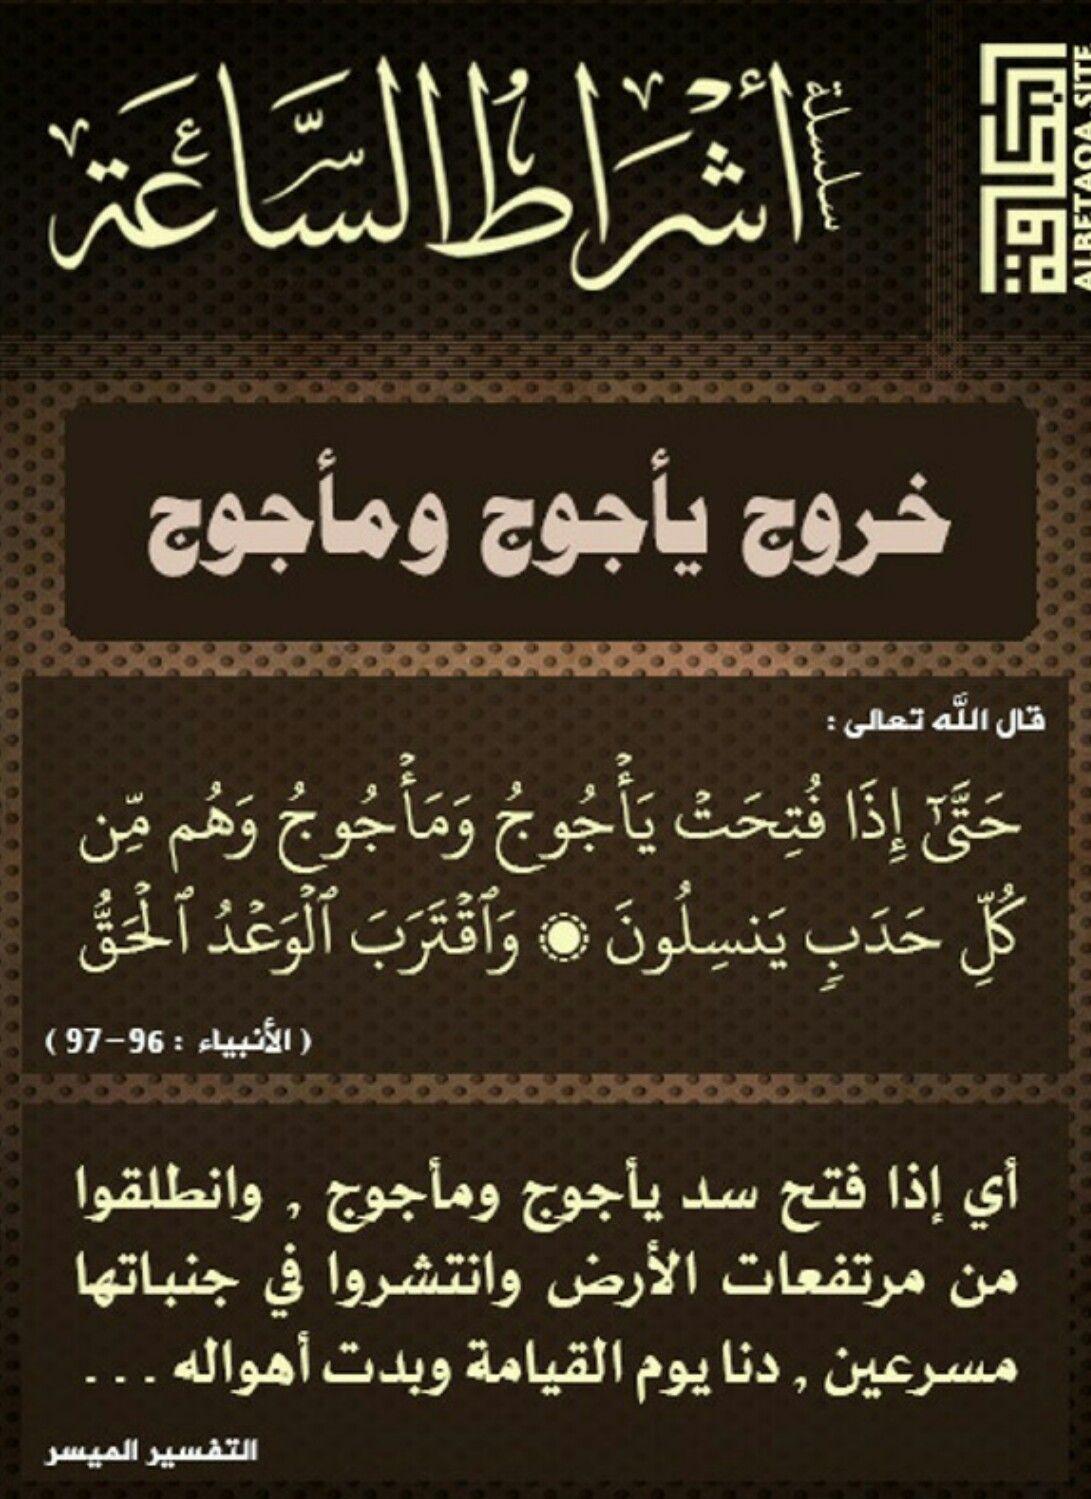 Pin By Farid On موسوعه الكلم الطيب كن مع الله Islamic Quotes Islam Quran Noble Quran